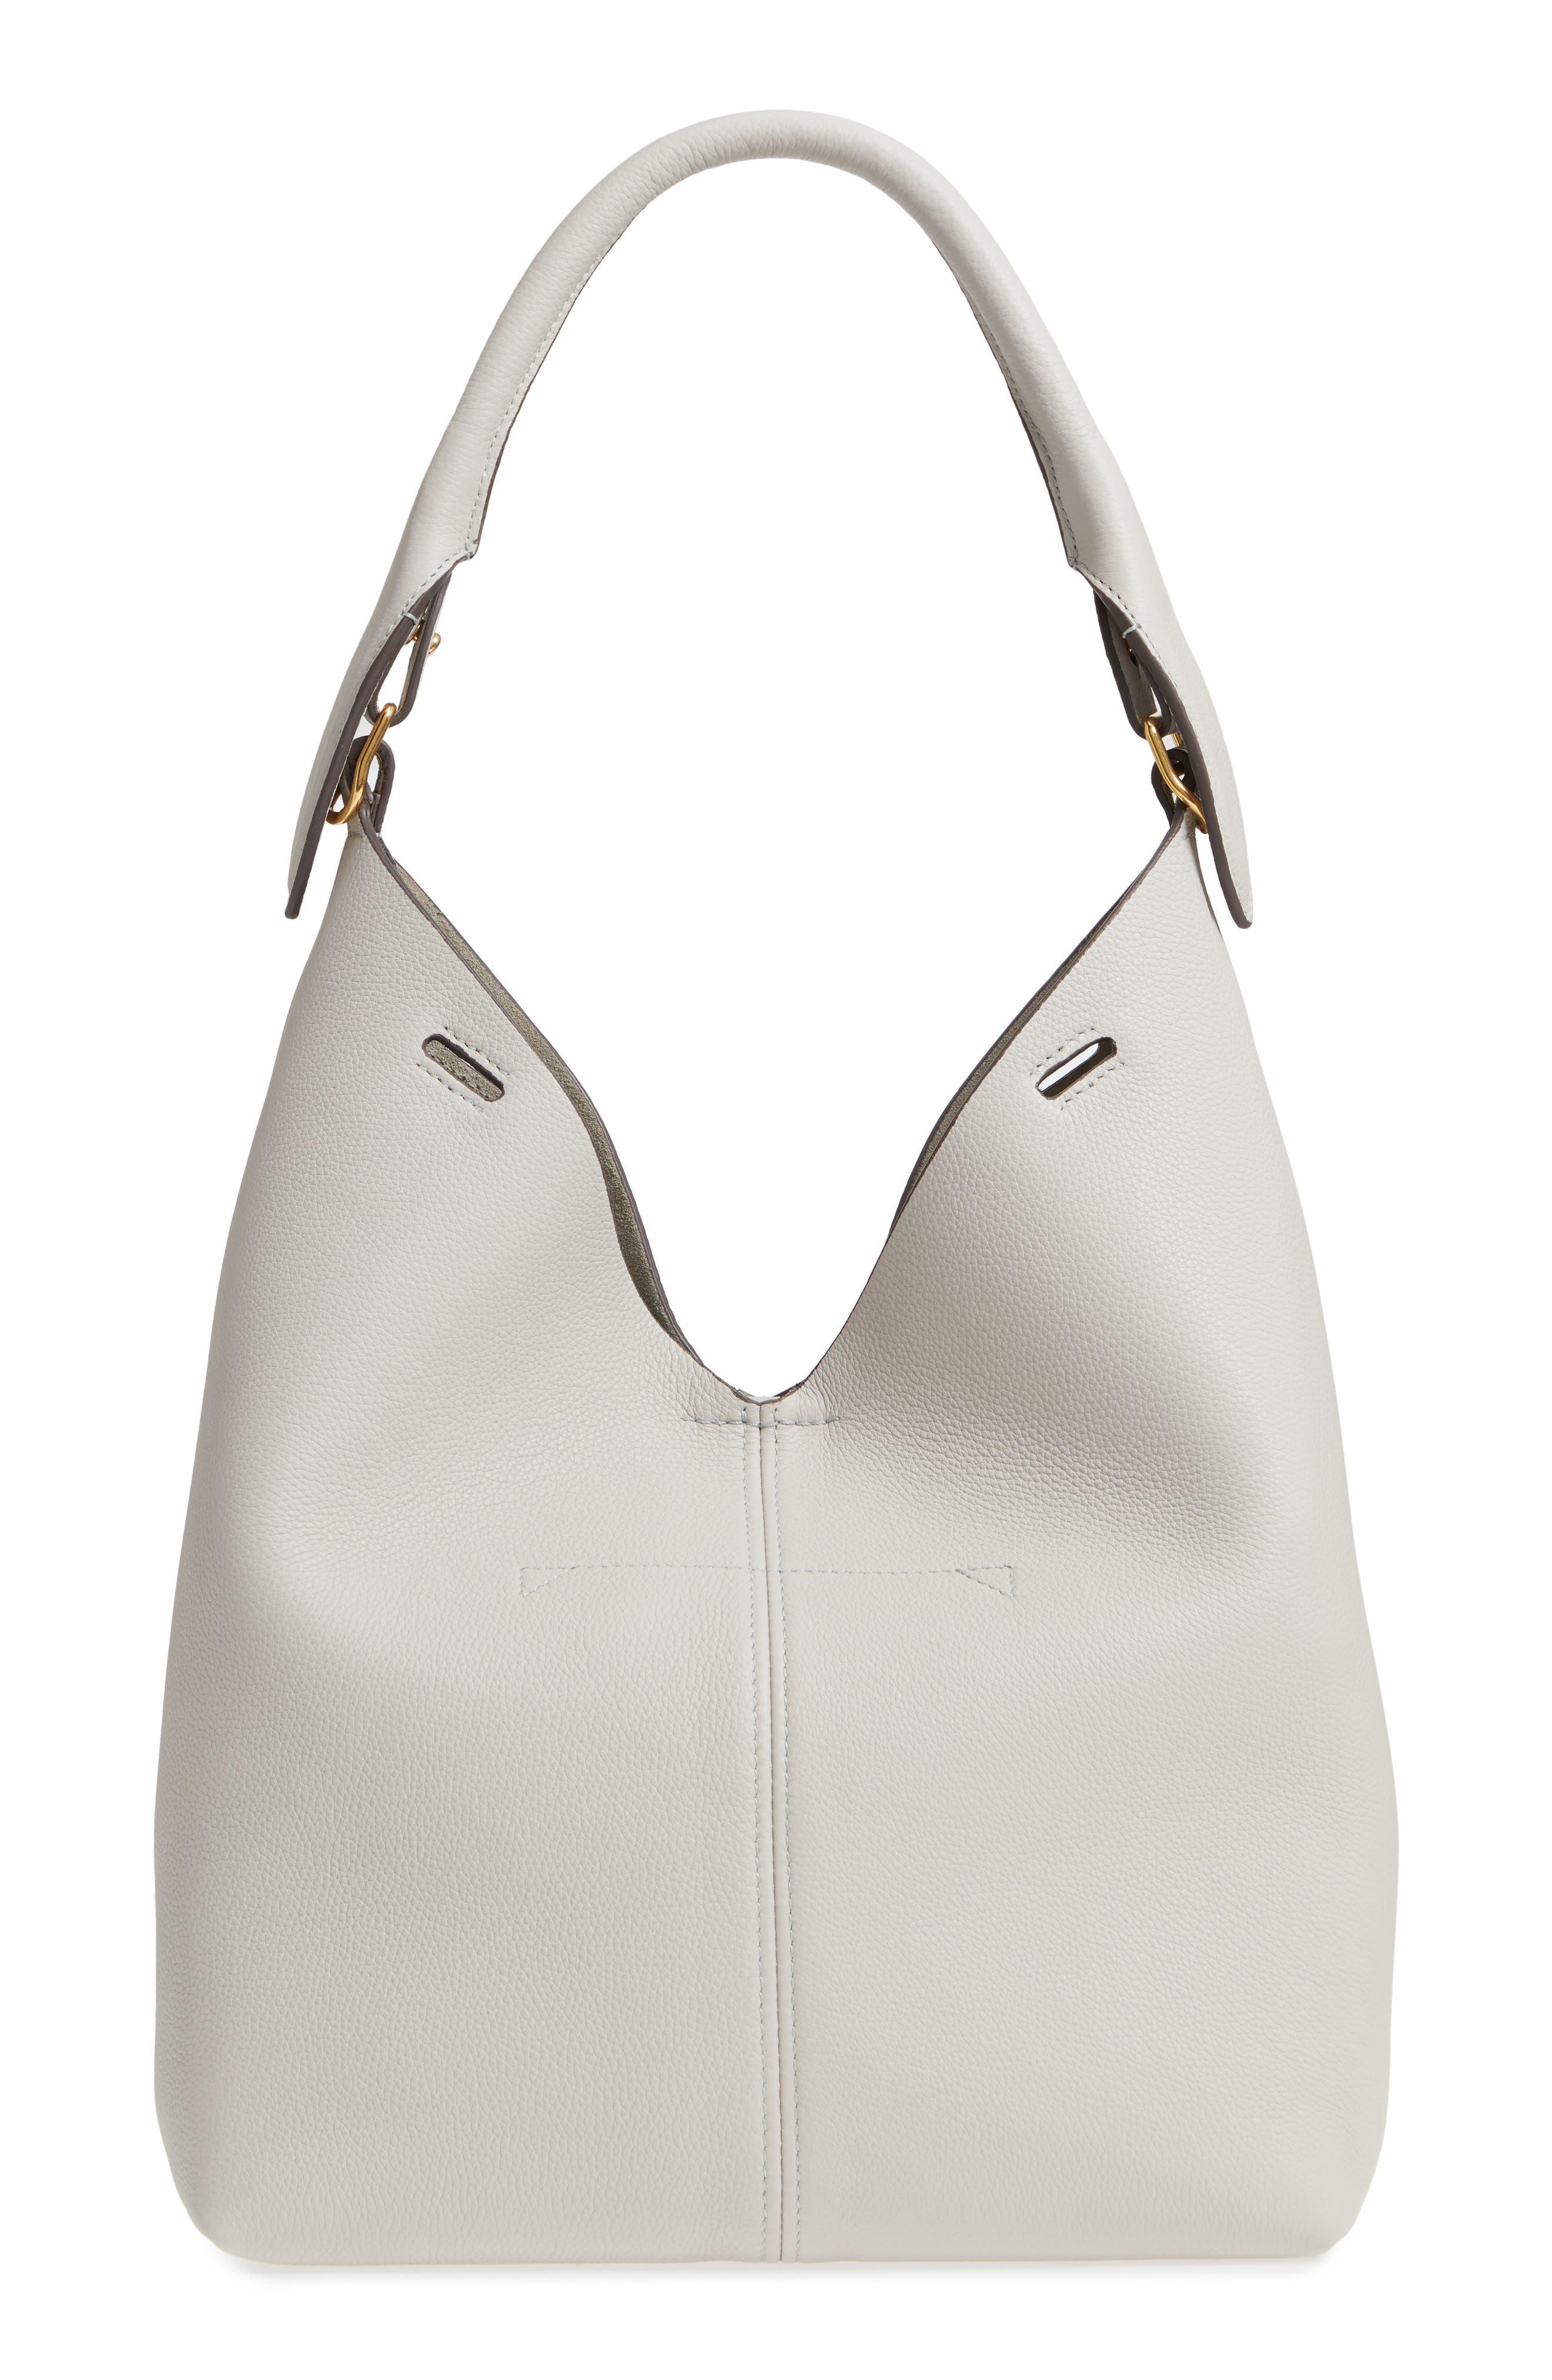 Anya Hindmarch Small Build a Bag Leather Base Bag